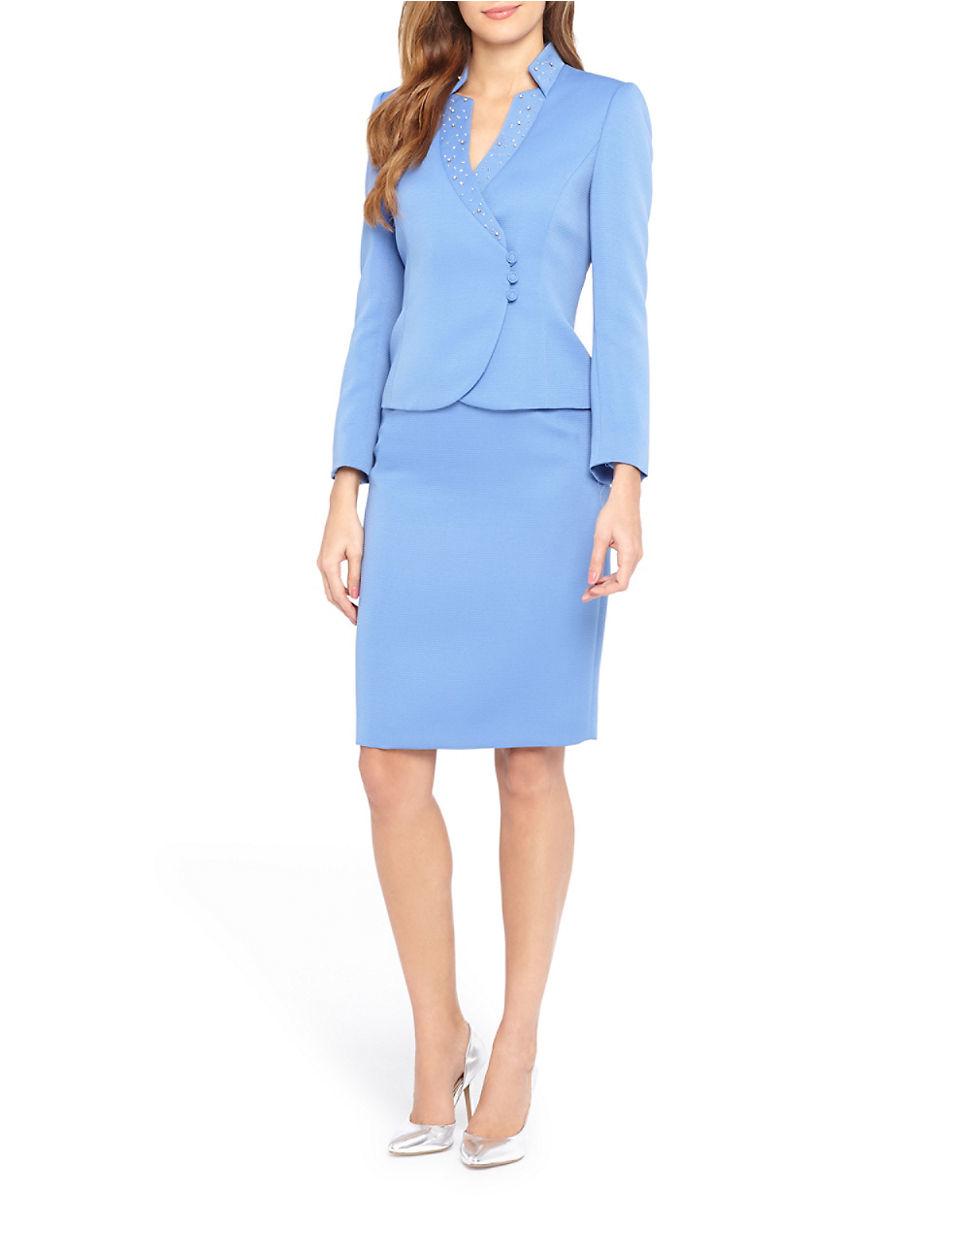 92c72f44e3605 Tahari Petite 2-piece Beaded Skirt Suit Set in Blue - Lyst